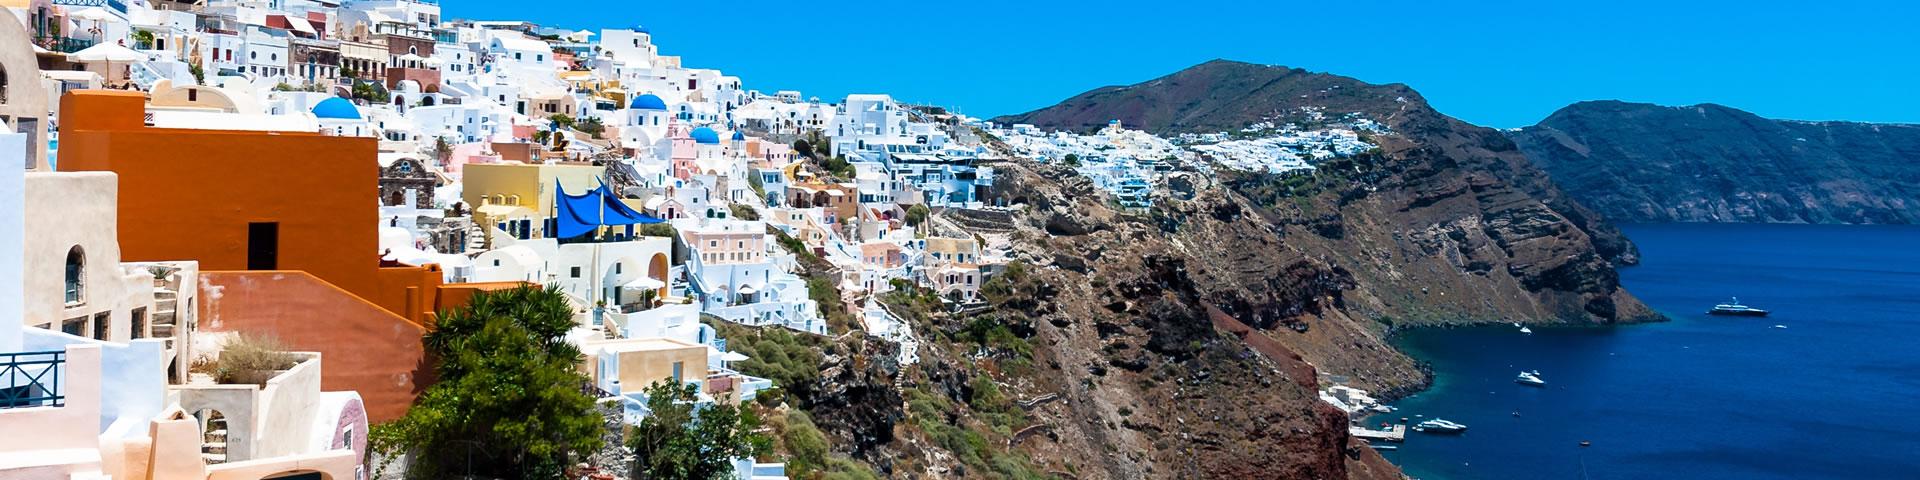 Santorini villages